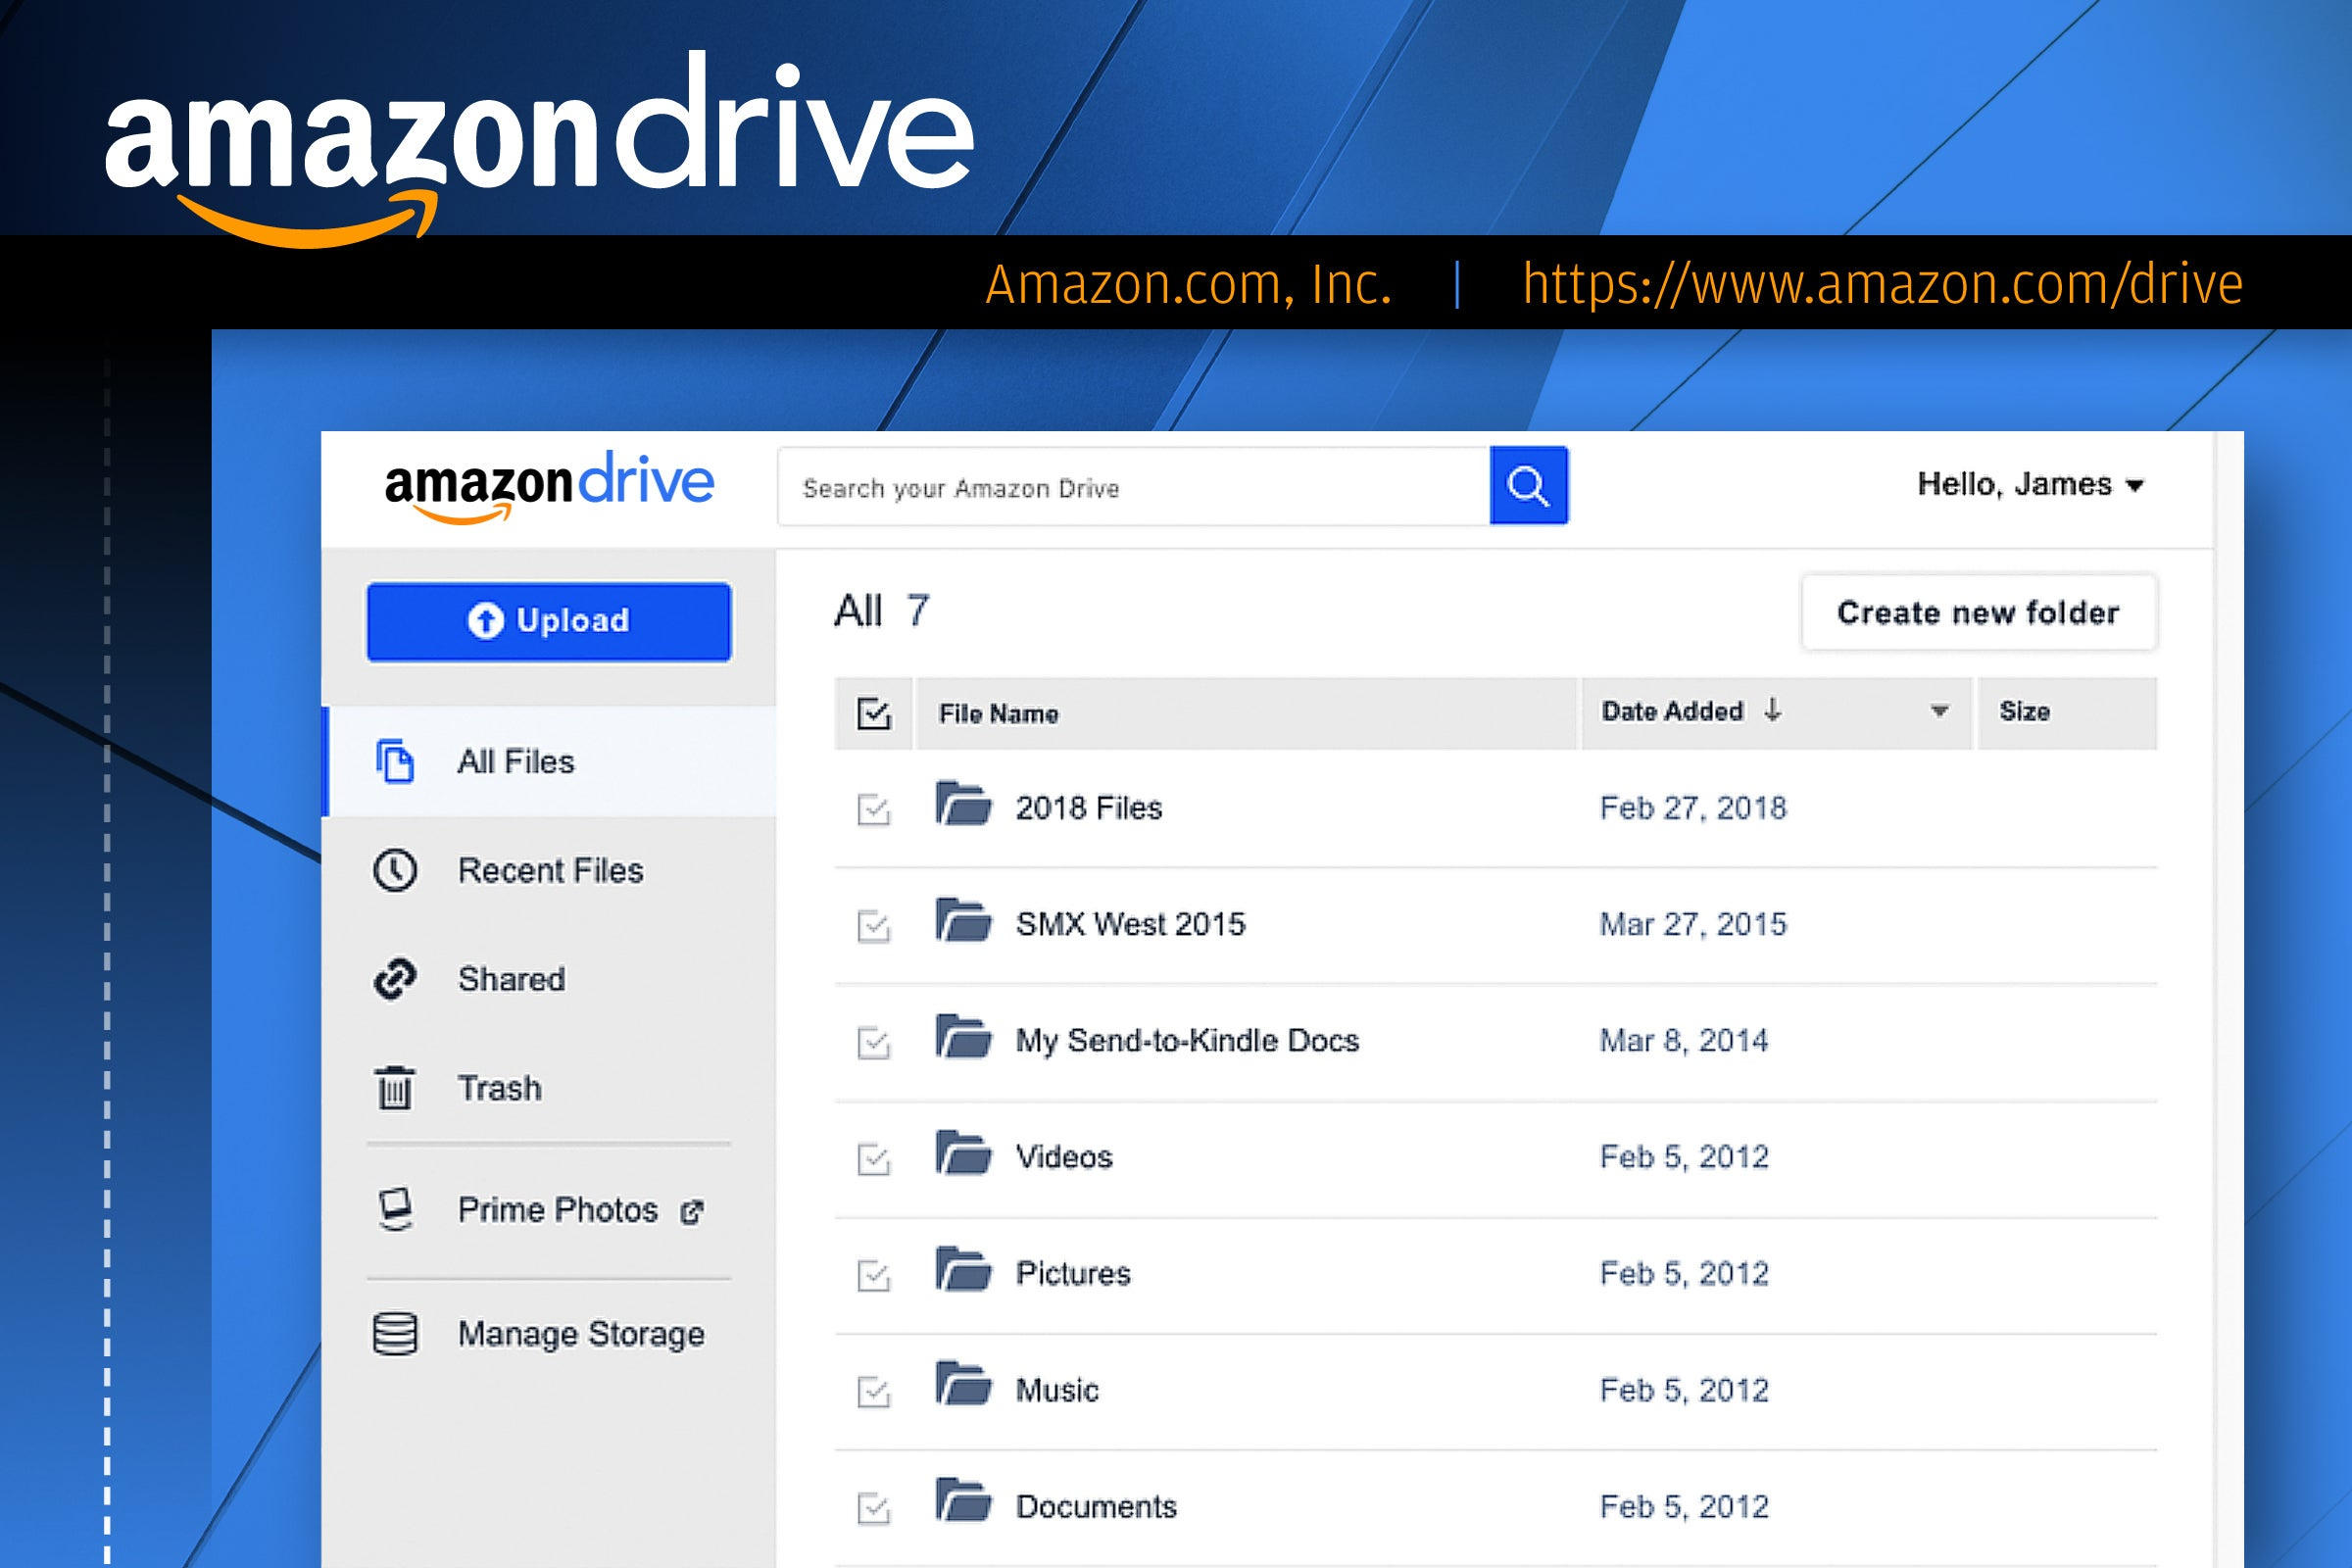 Top 30 file sharing options Dropbox, Box, Google Drive, OneDrive ...